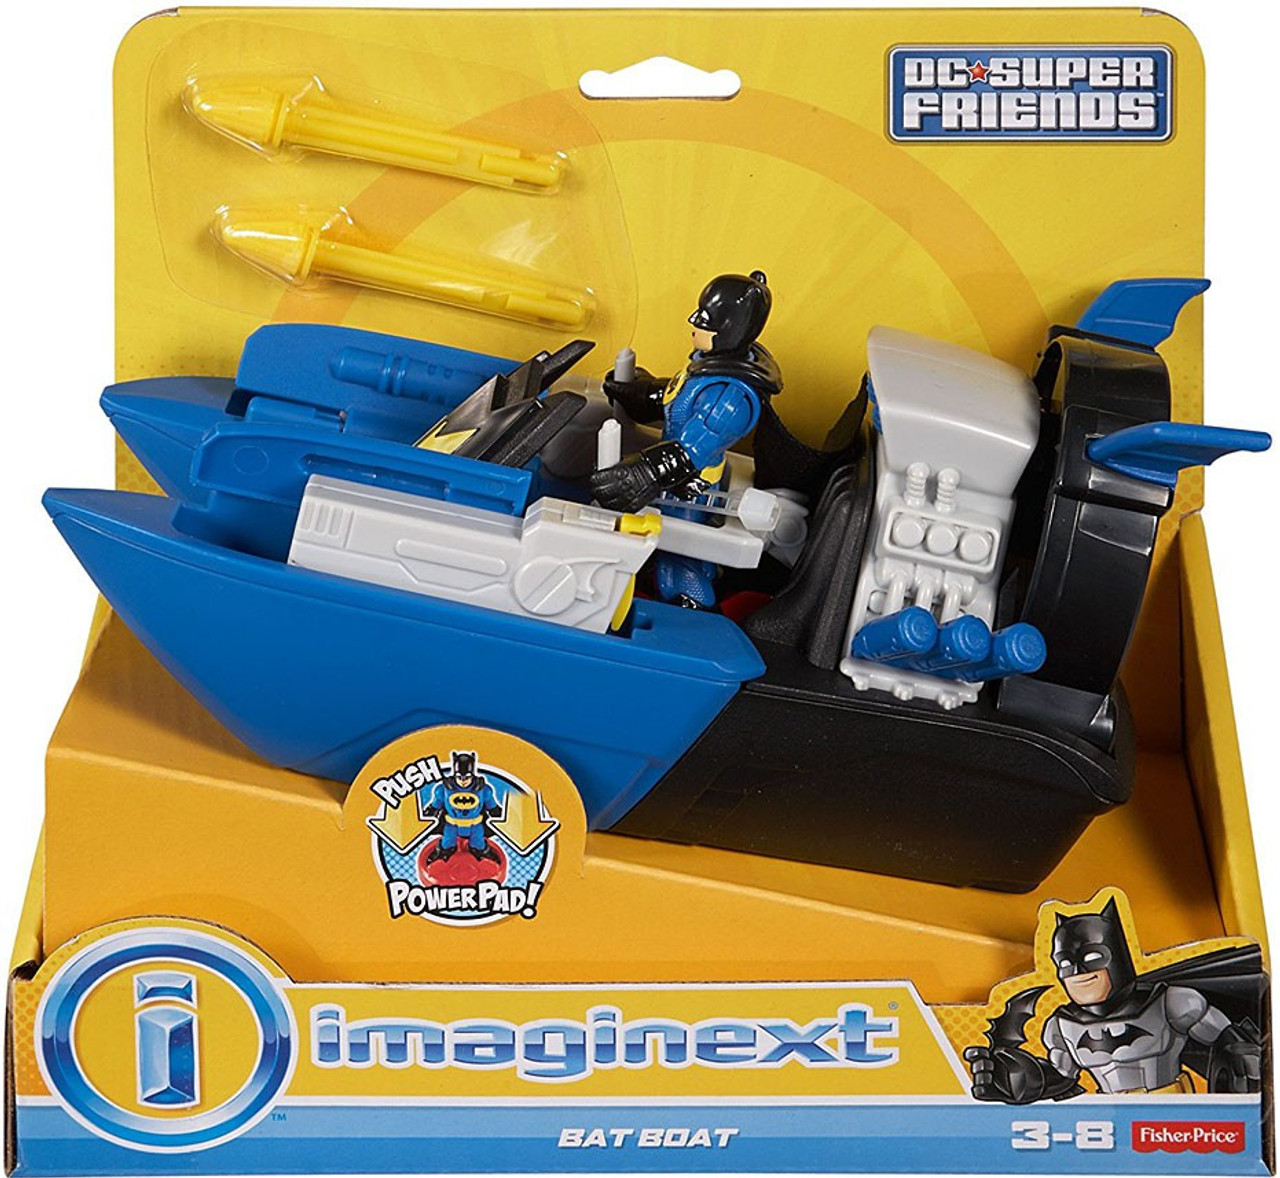 fisher price dc super friends batman imaginext bat boat 3 figure